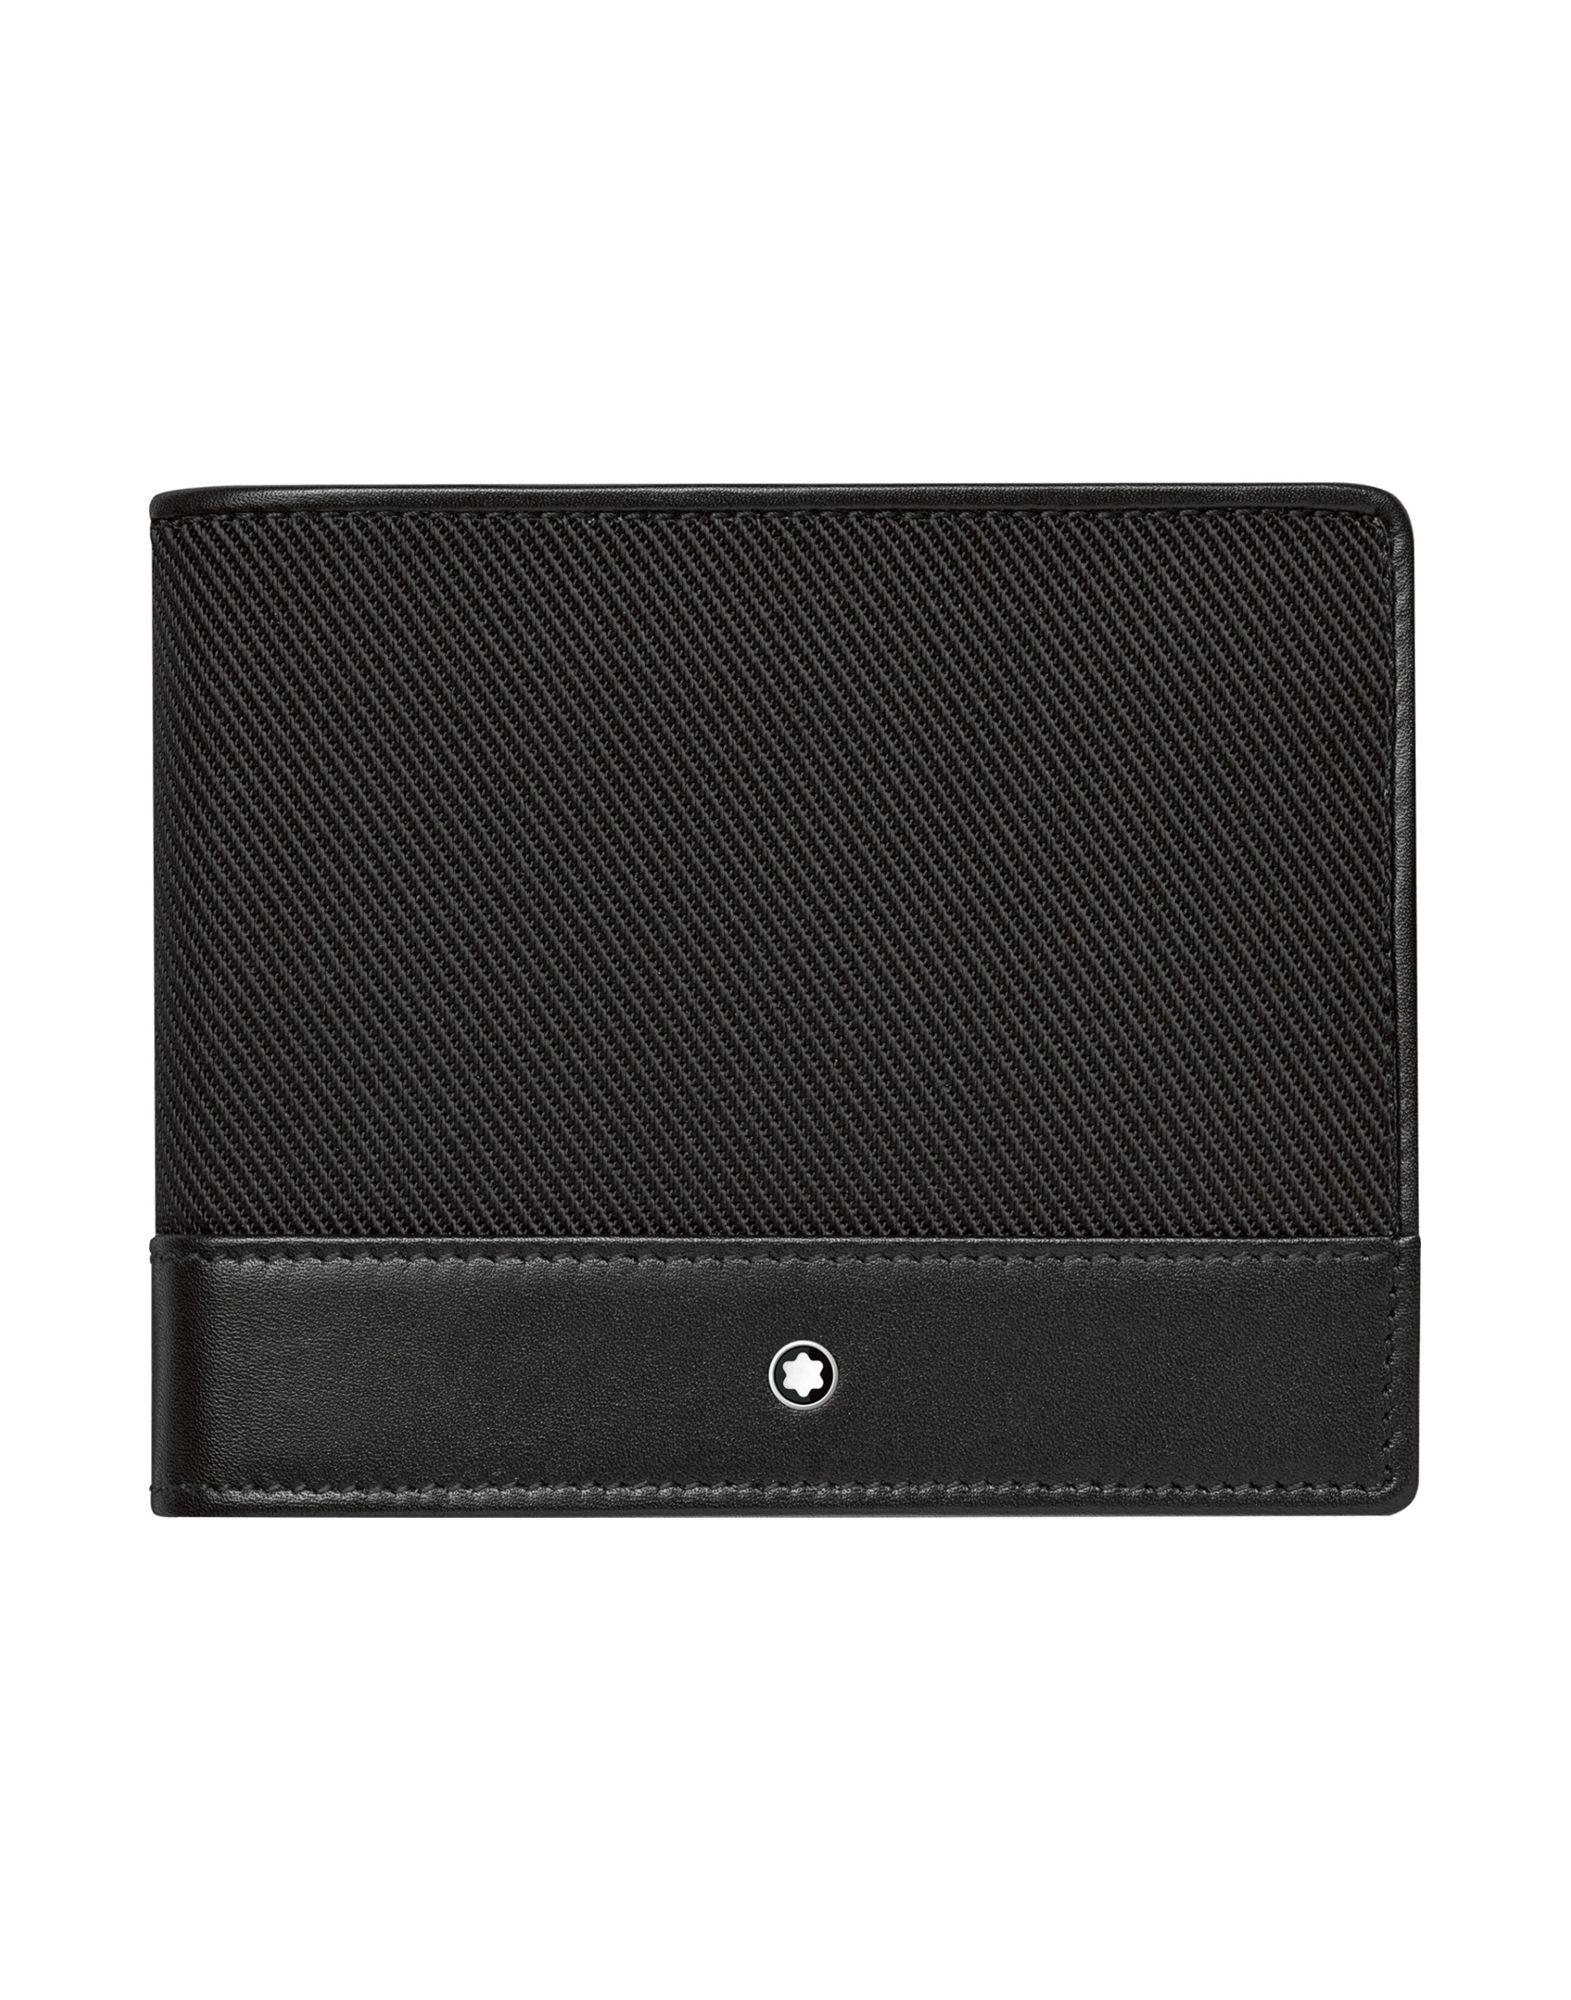 Portafoglio Montblanc Nightflight Wallet 6Cc - Uomo - Acquista online su